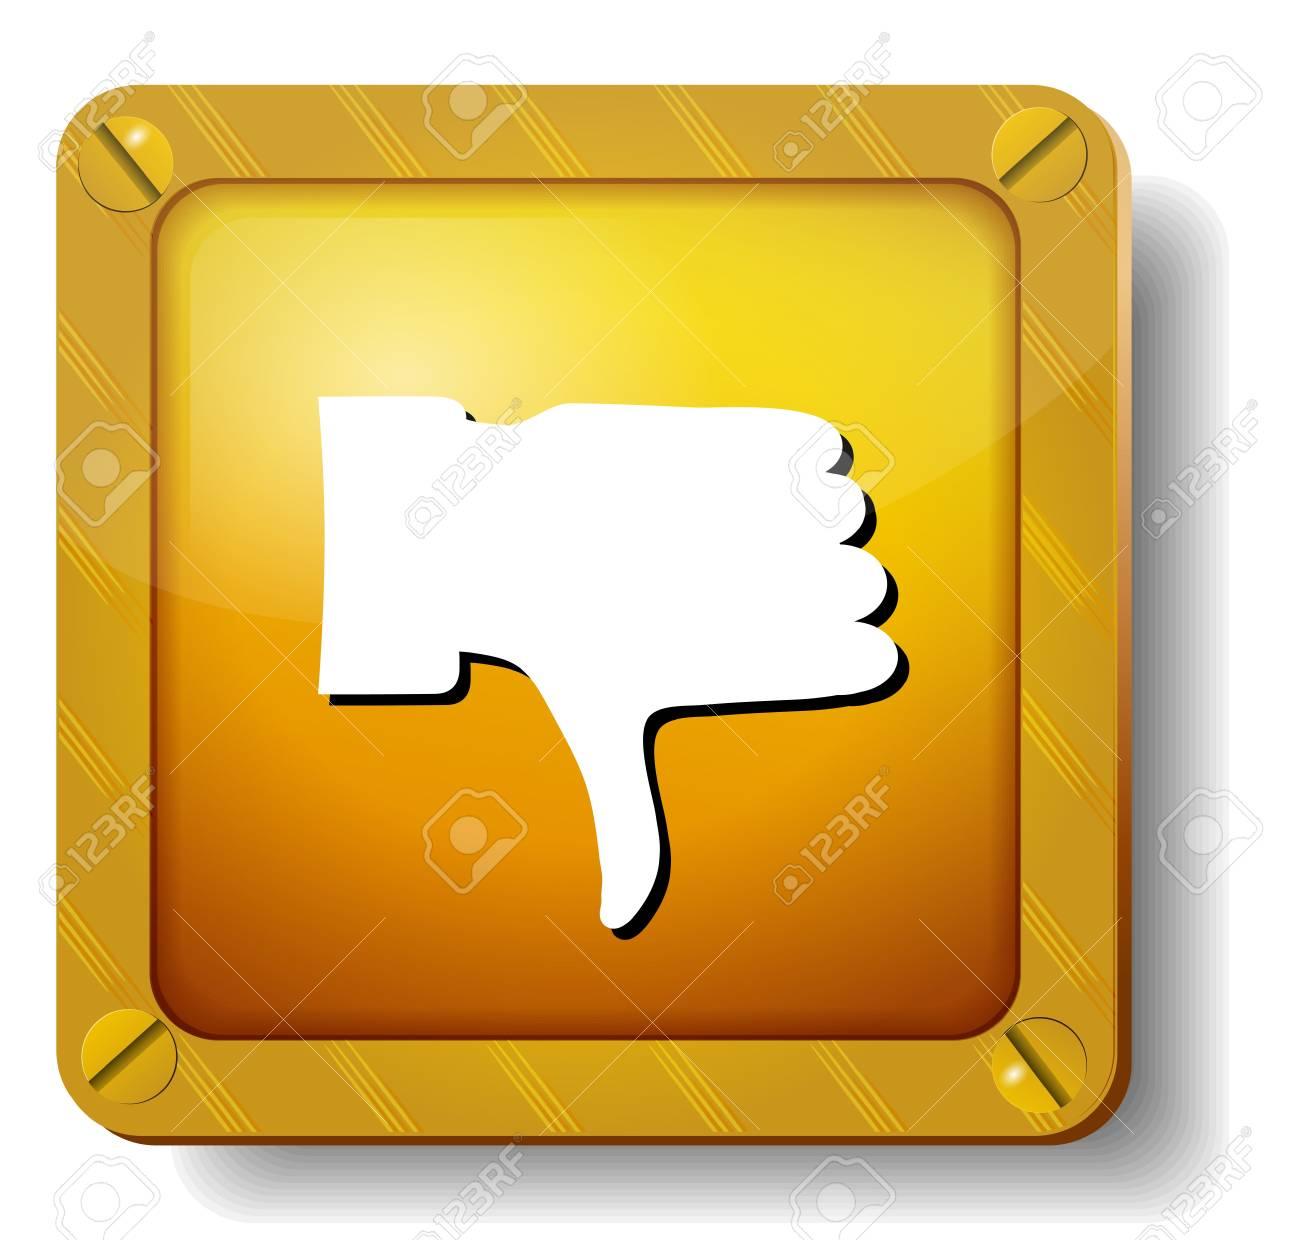 golden thumb down icon Stock Vector - 20269696